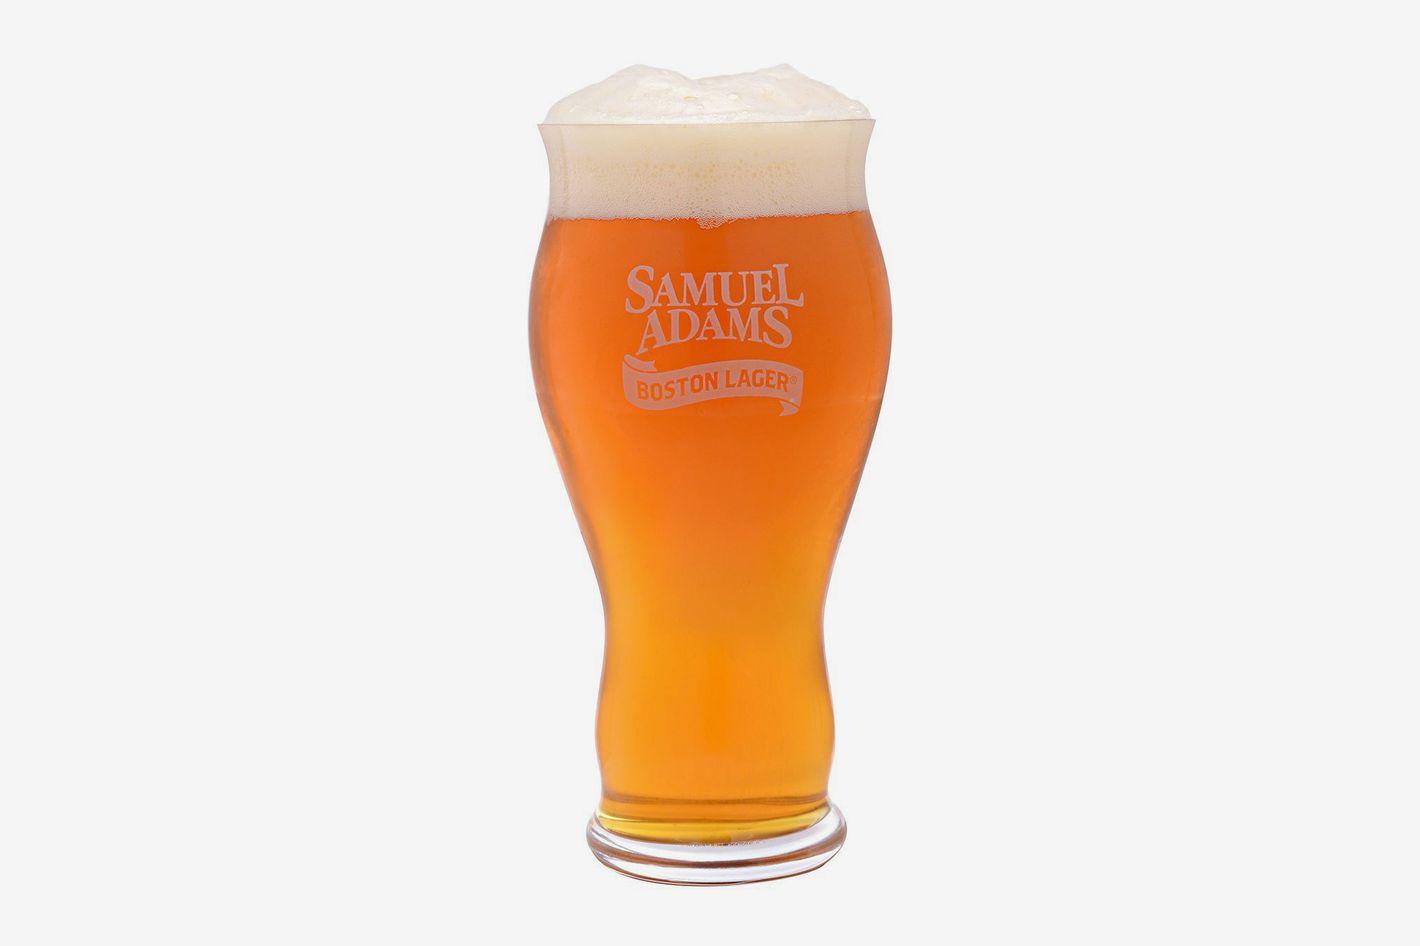 Spiegelau Classics Sam Adams Boston Lager Beer Glasses